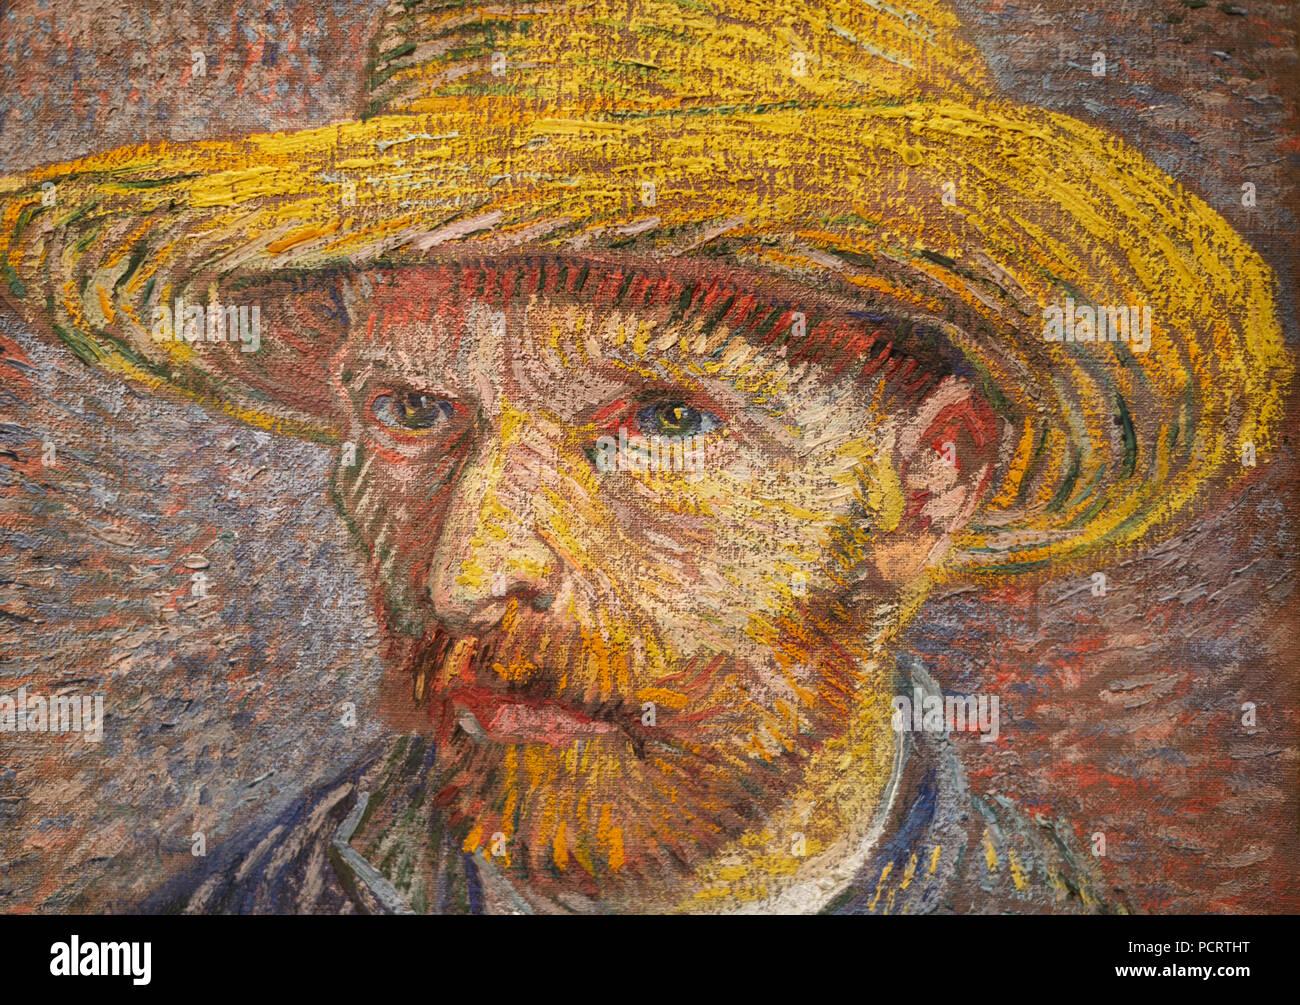 Van Gogh self portrait, 'Self-portrait with Straw Hat', 1887, detail - Stock Image